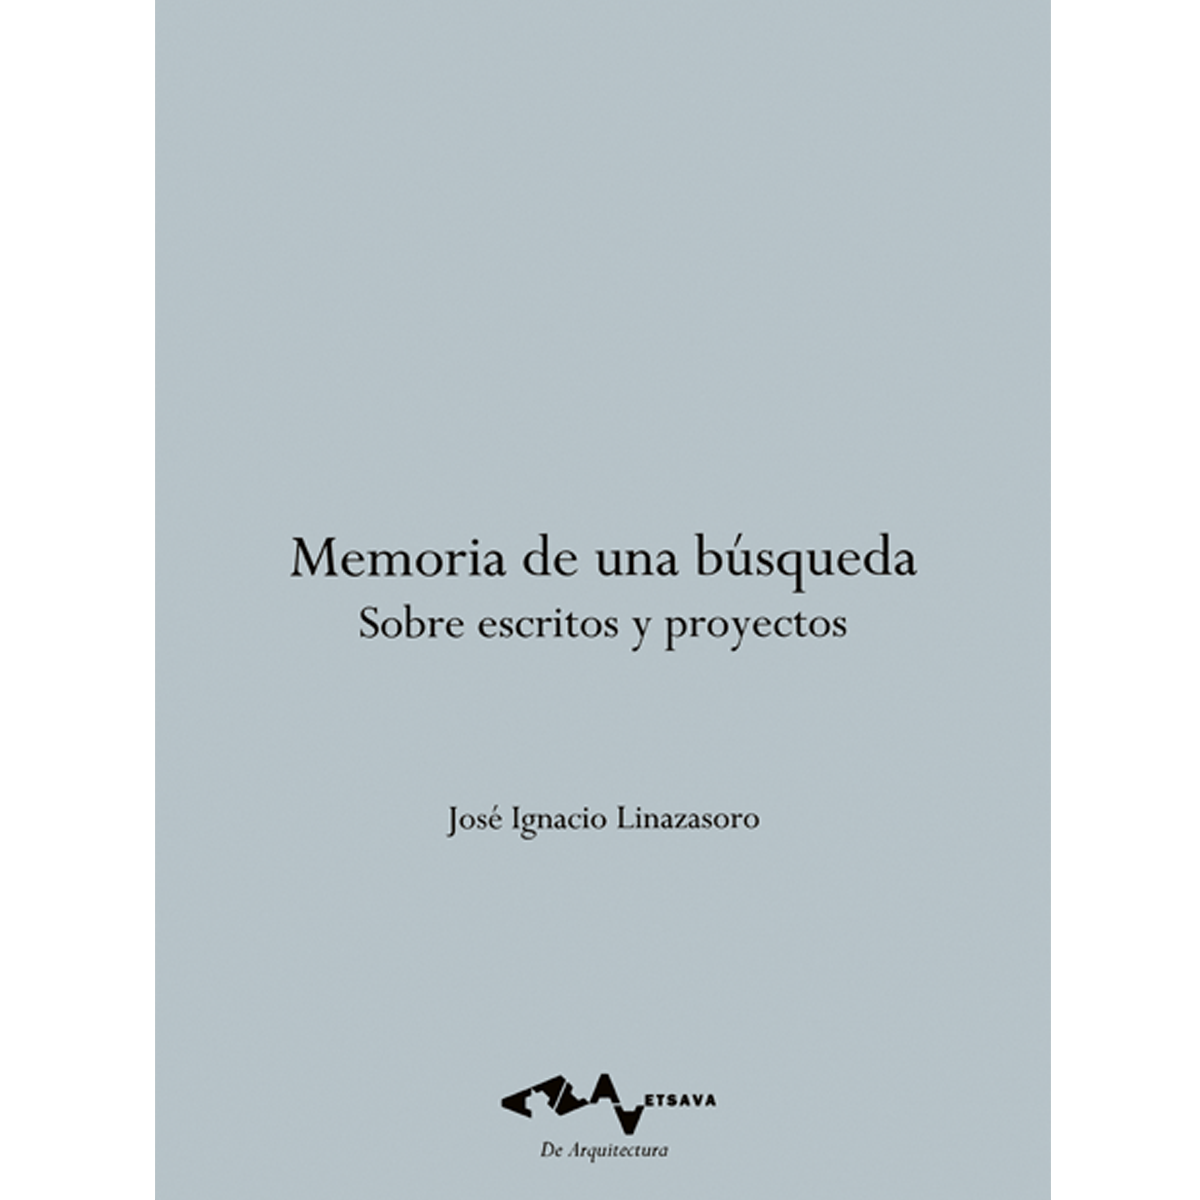 Memoria de una búsqueda